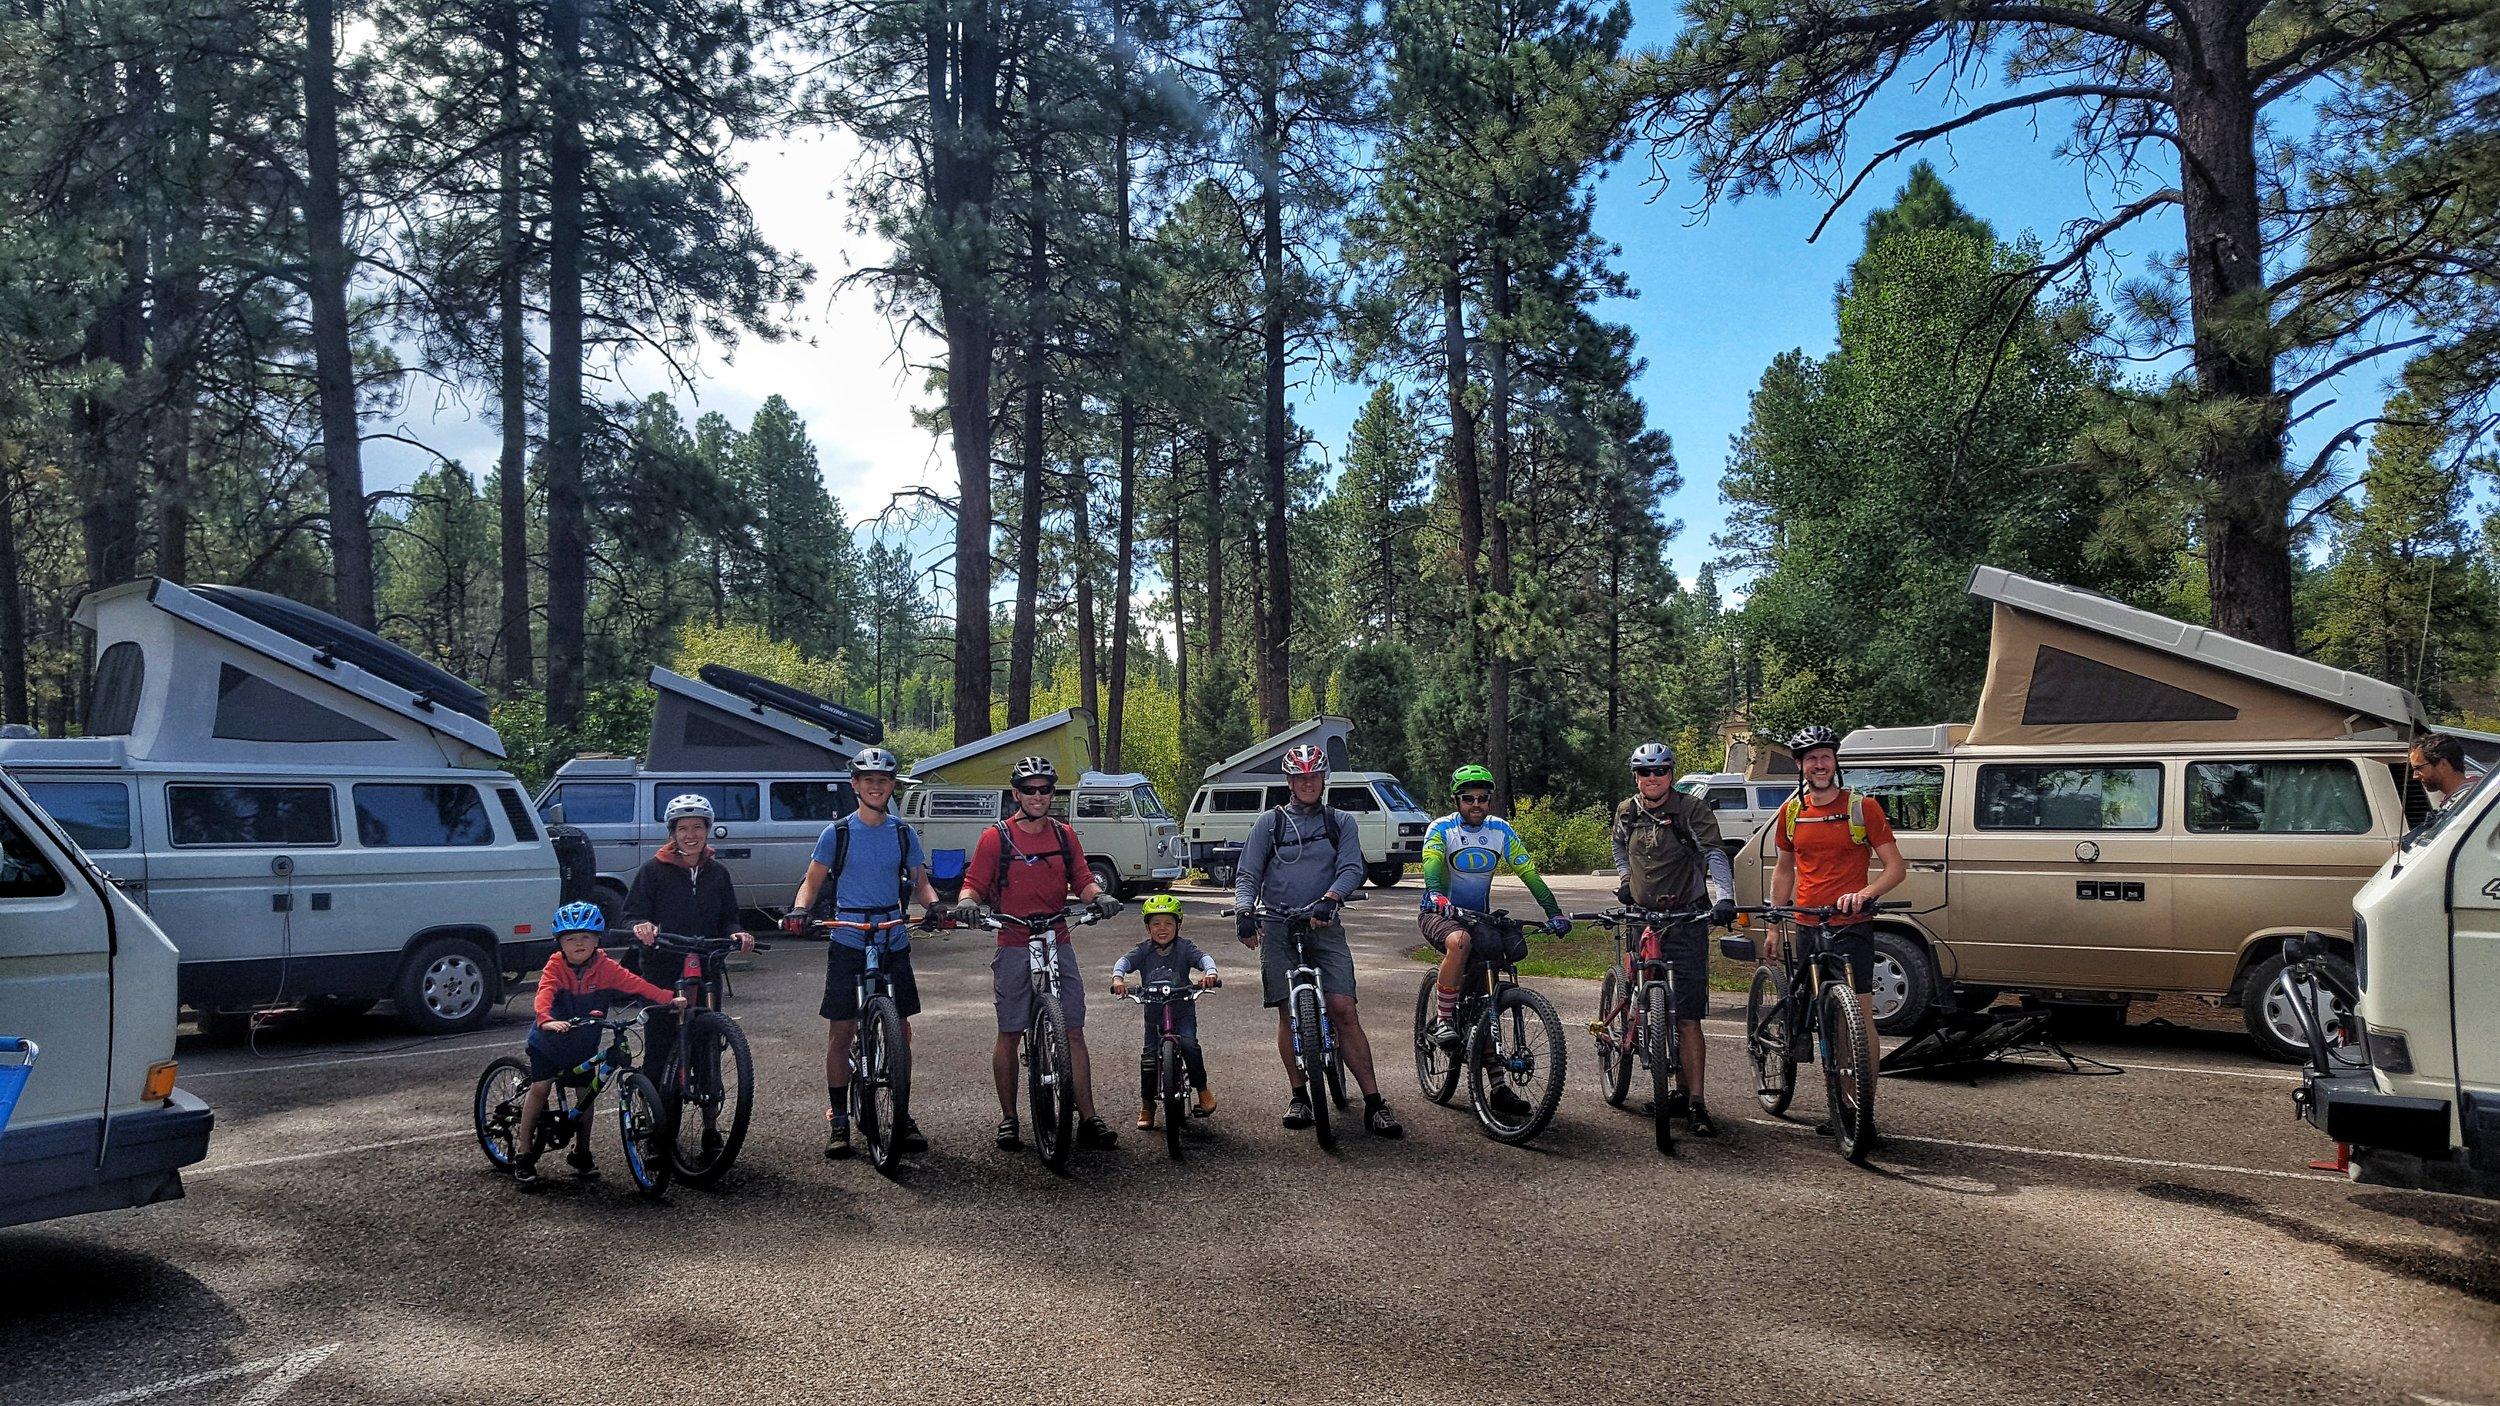 Heading out for a group mountain biking ride, Westyfest 2018, Durango, Colorado.